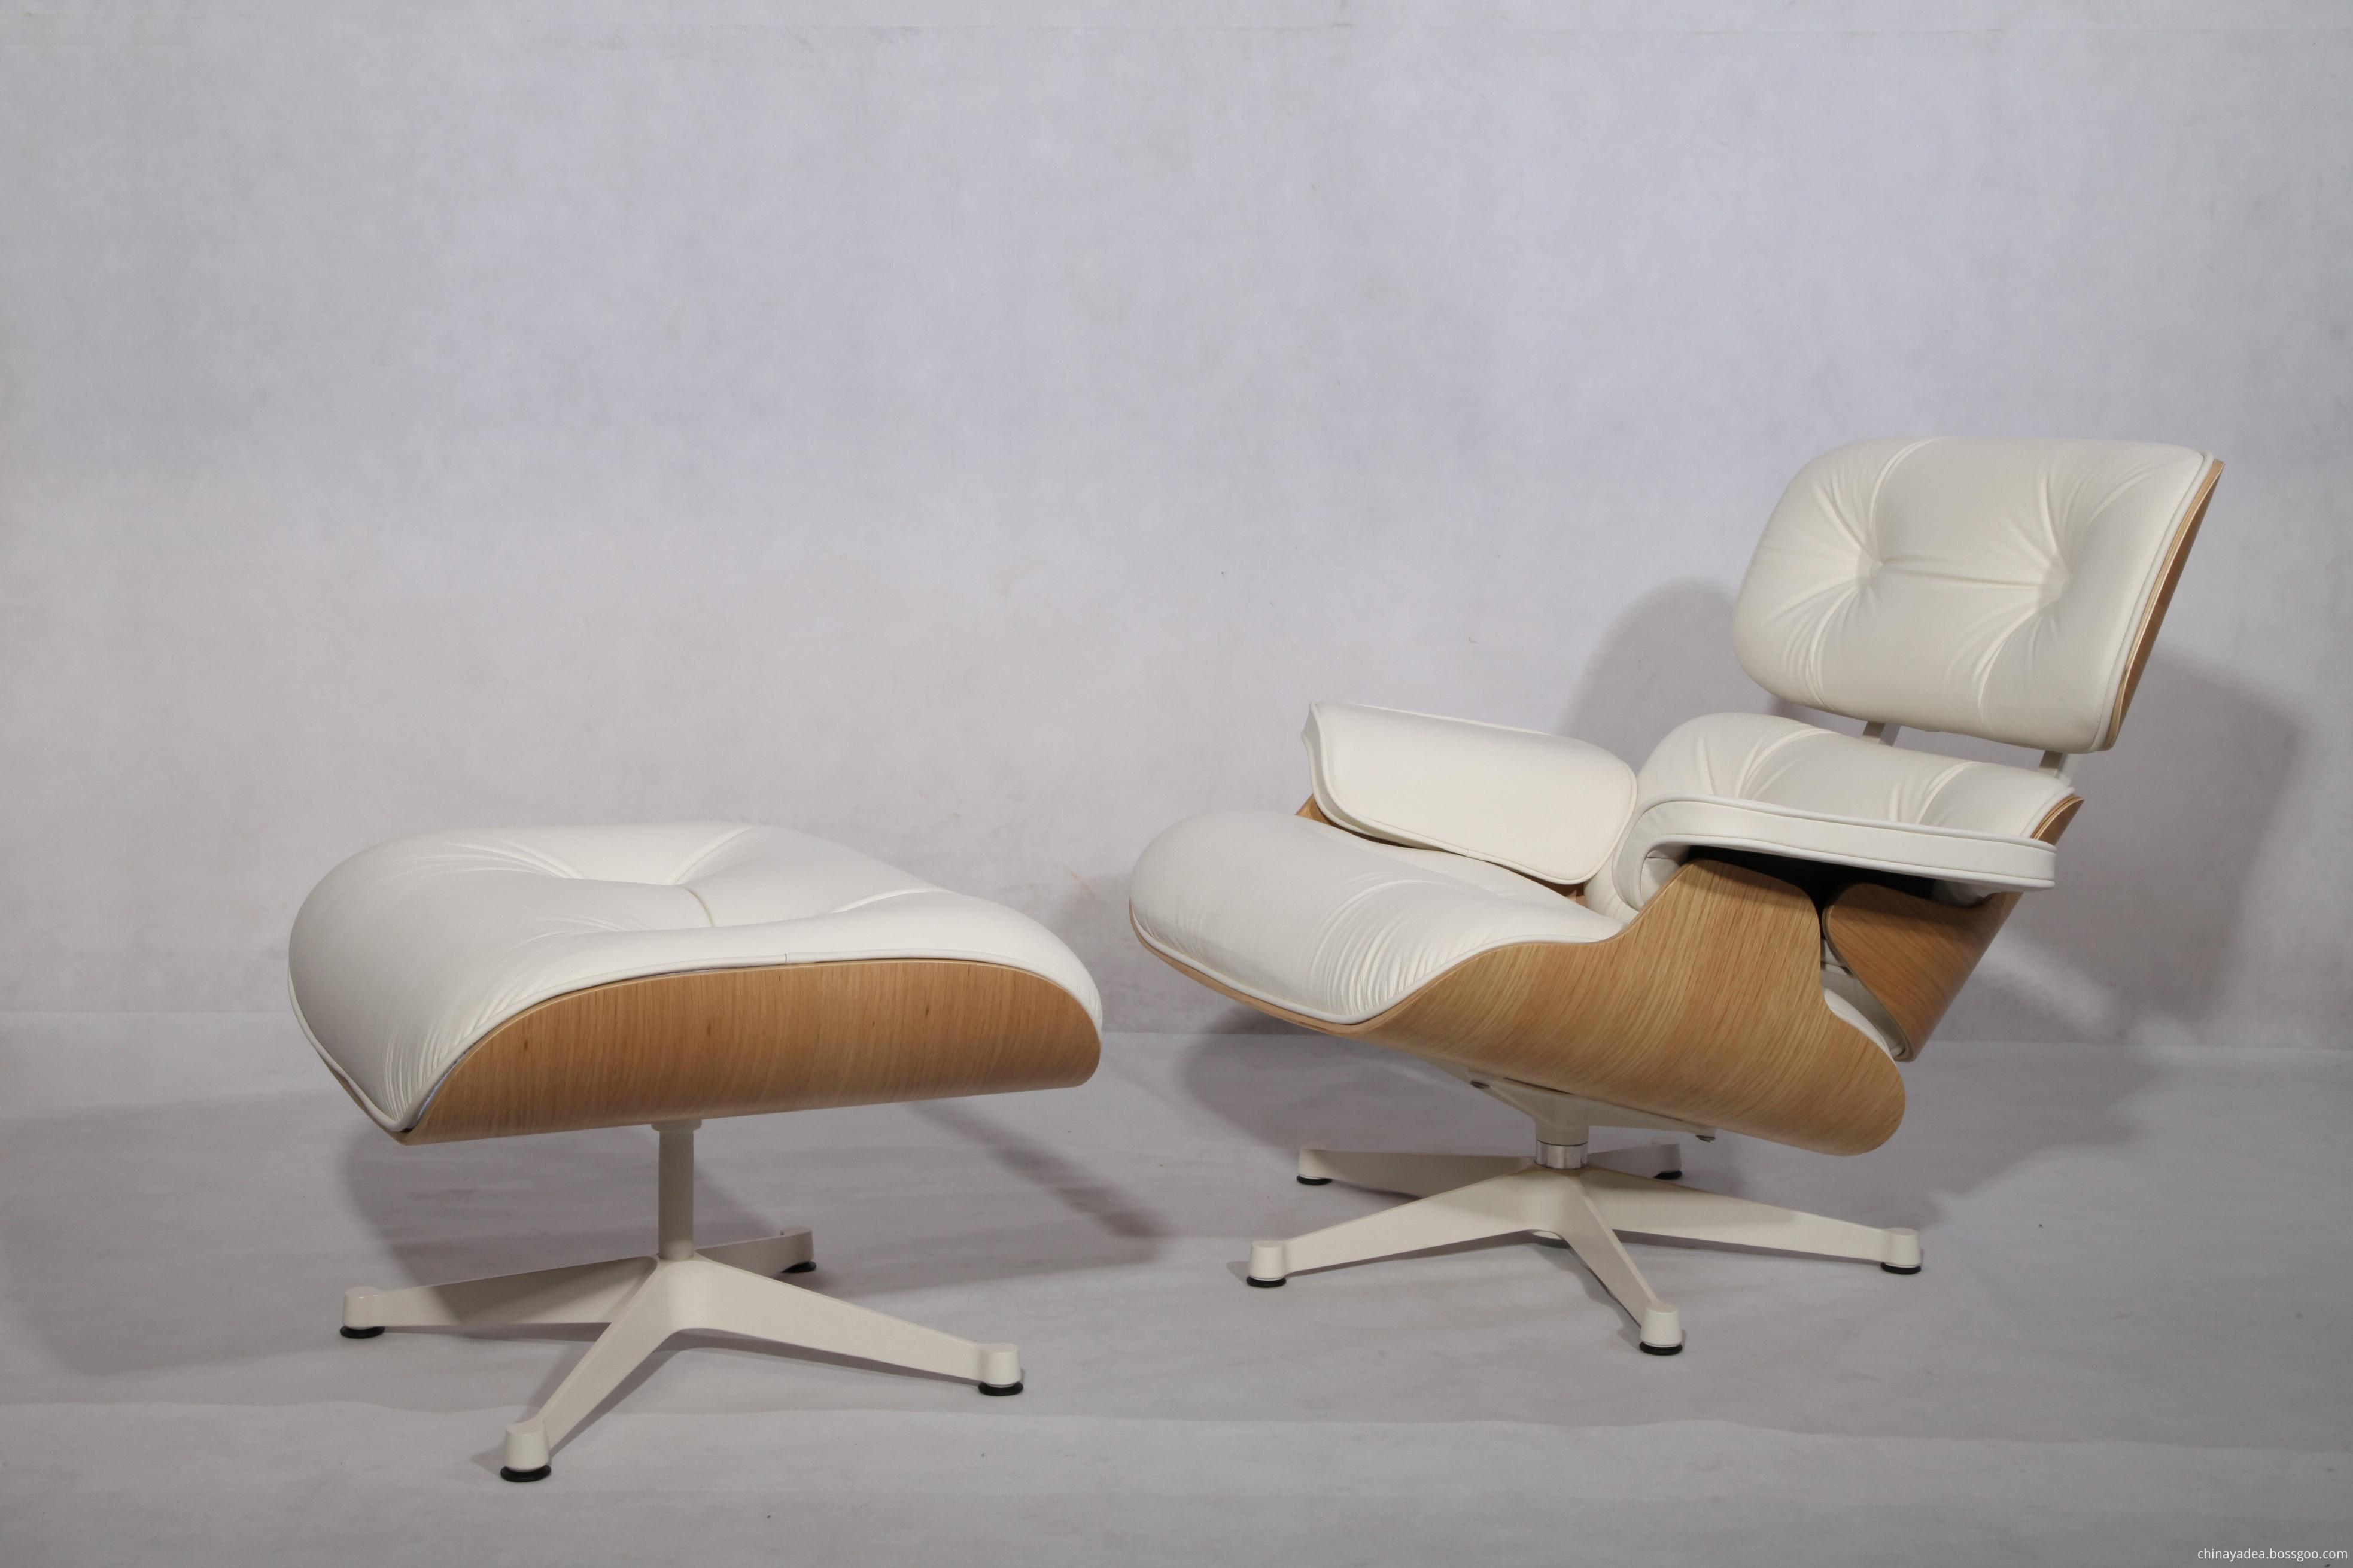 Charles and Ray Eames Oak Wood veneer and white base